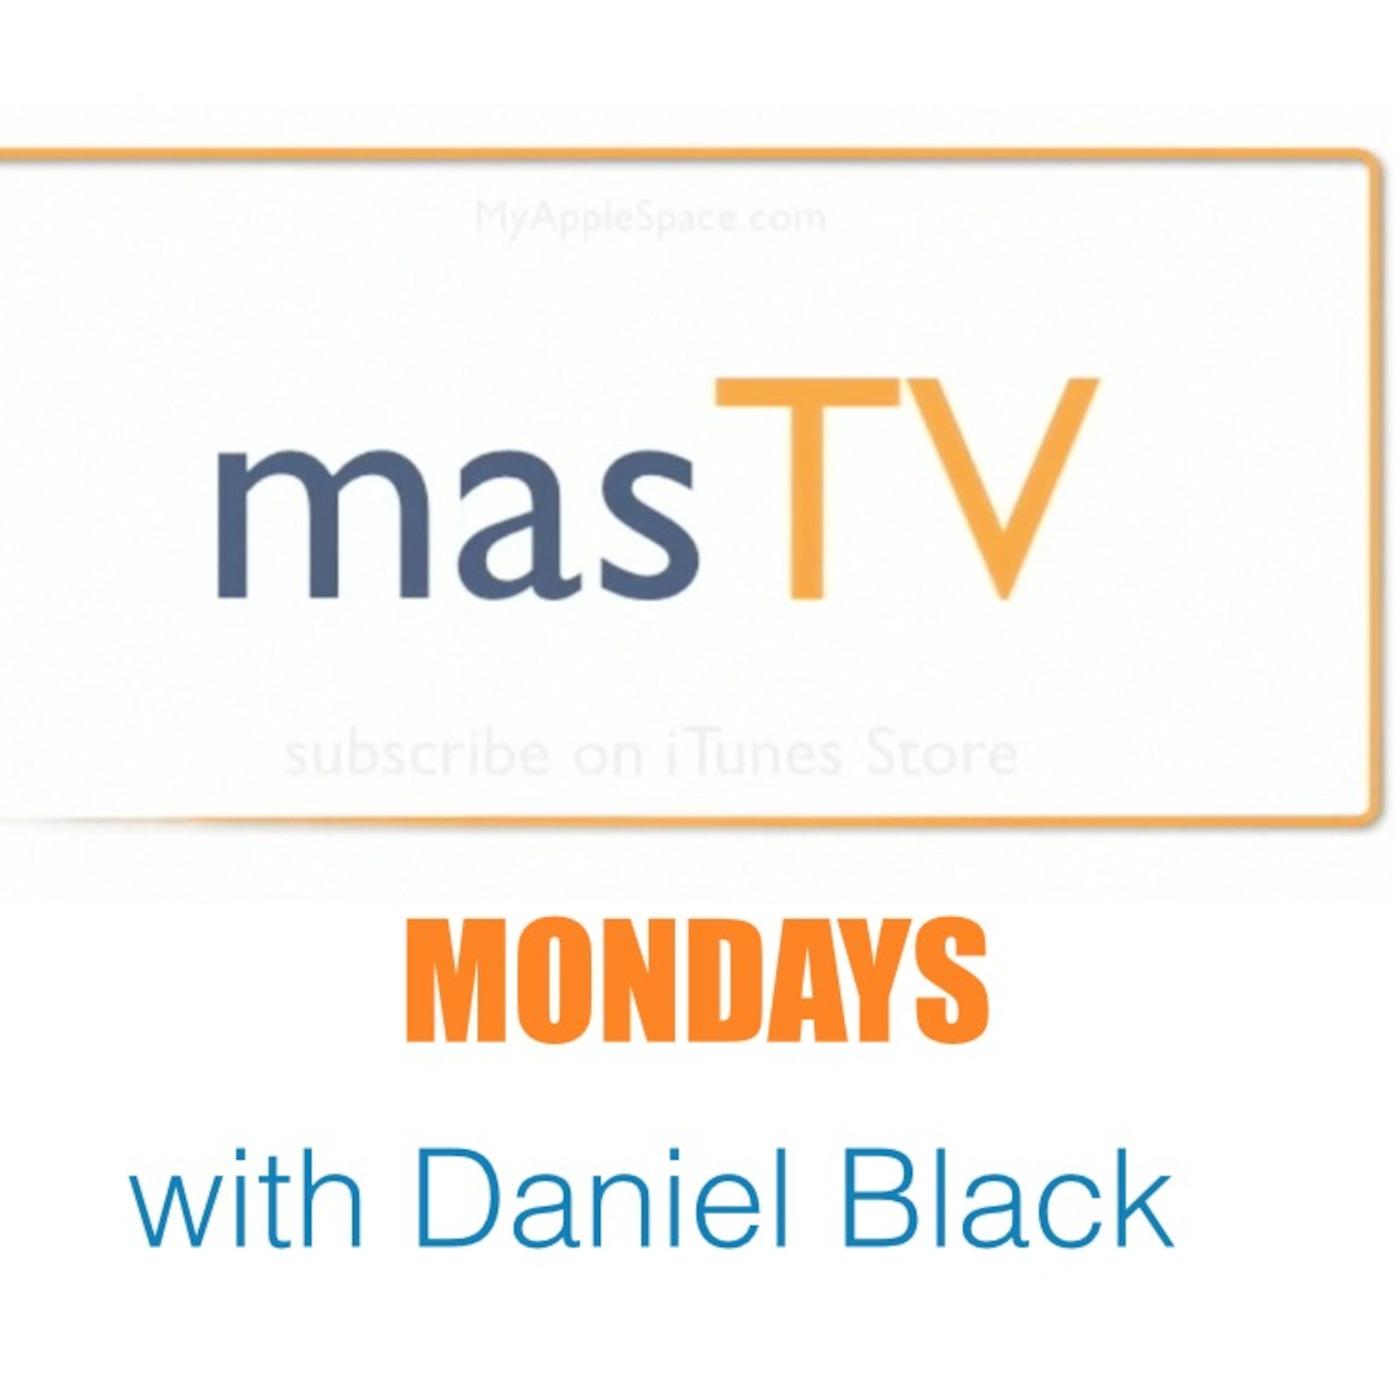 masTV Mondays